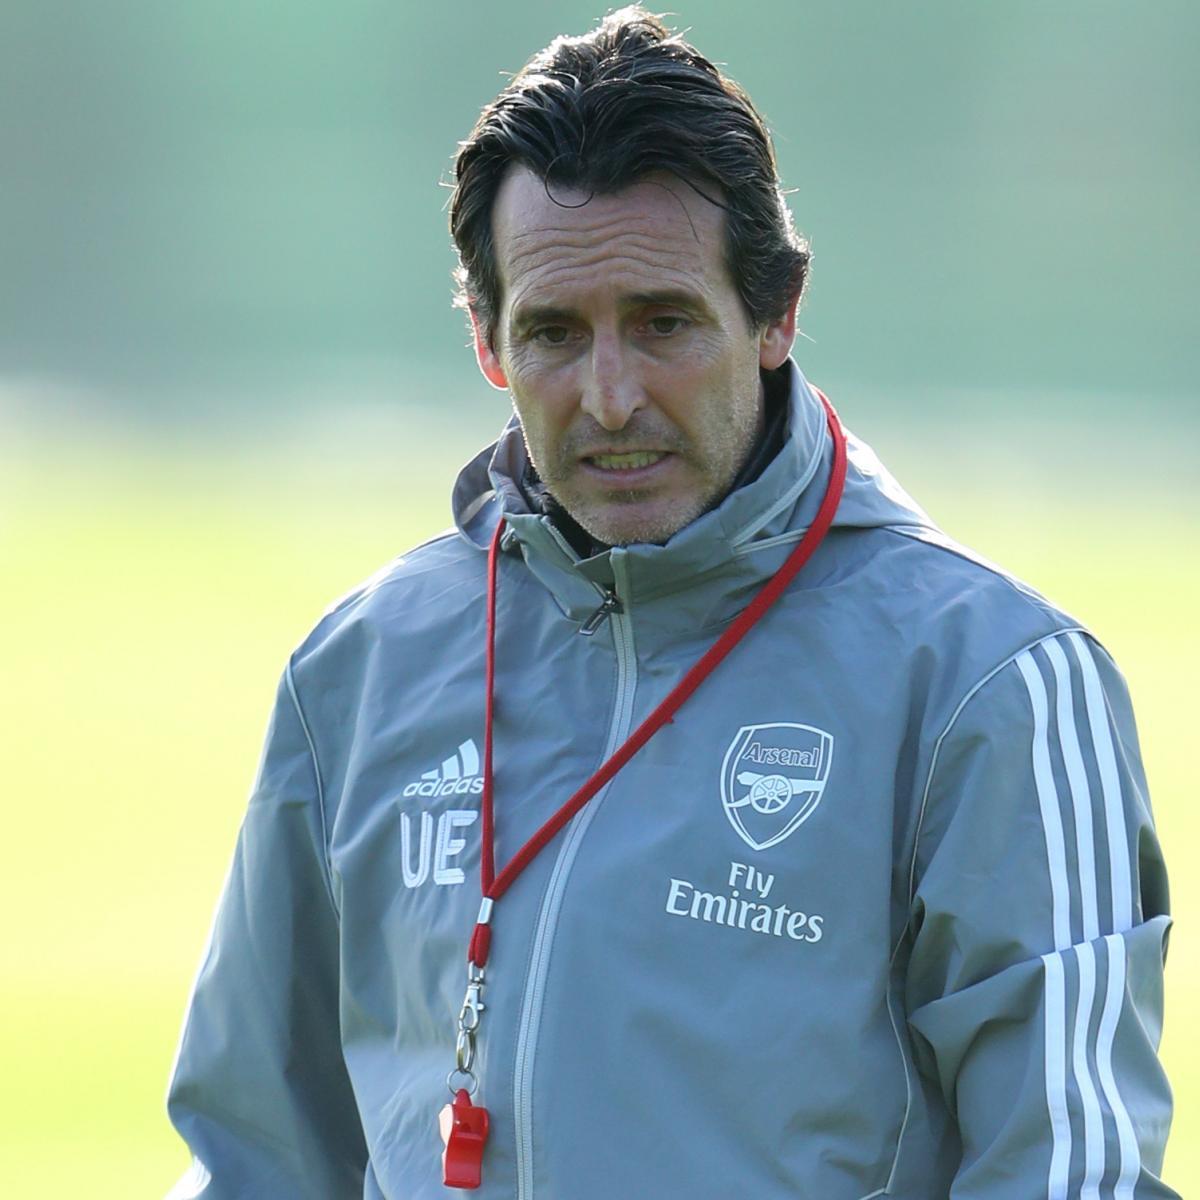 Unai Emery Says His Arsenal 'Future Is Today and Tomorrow' Amid Fan Pressure